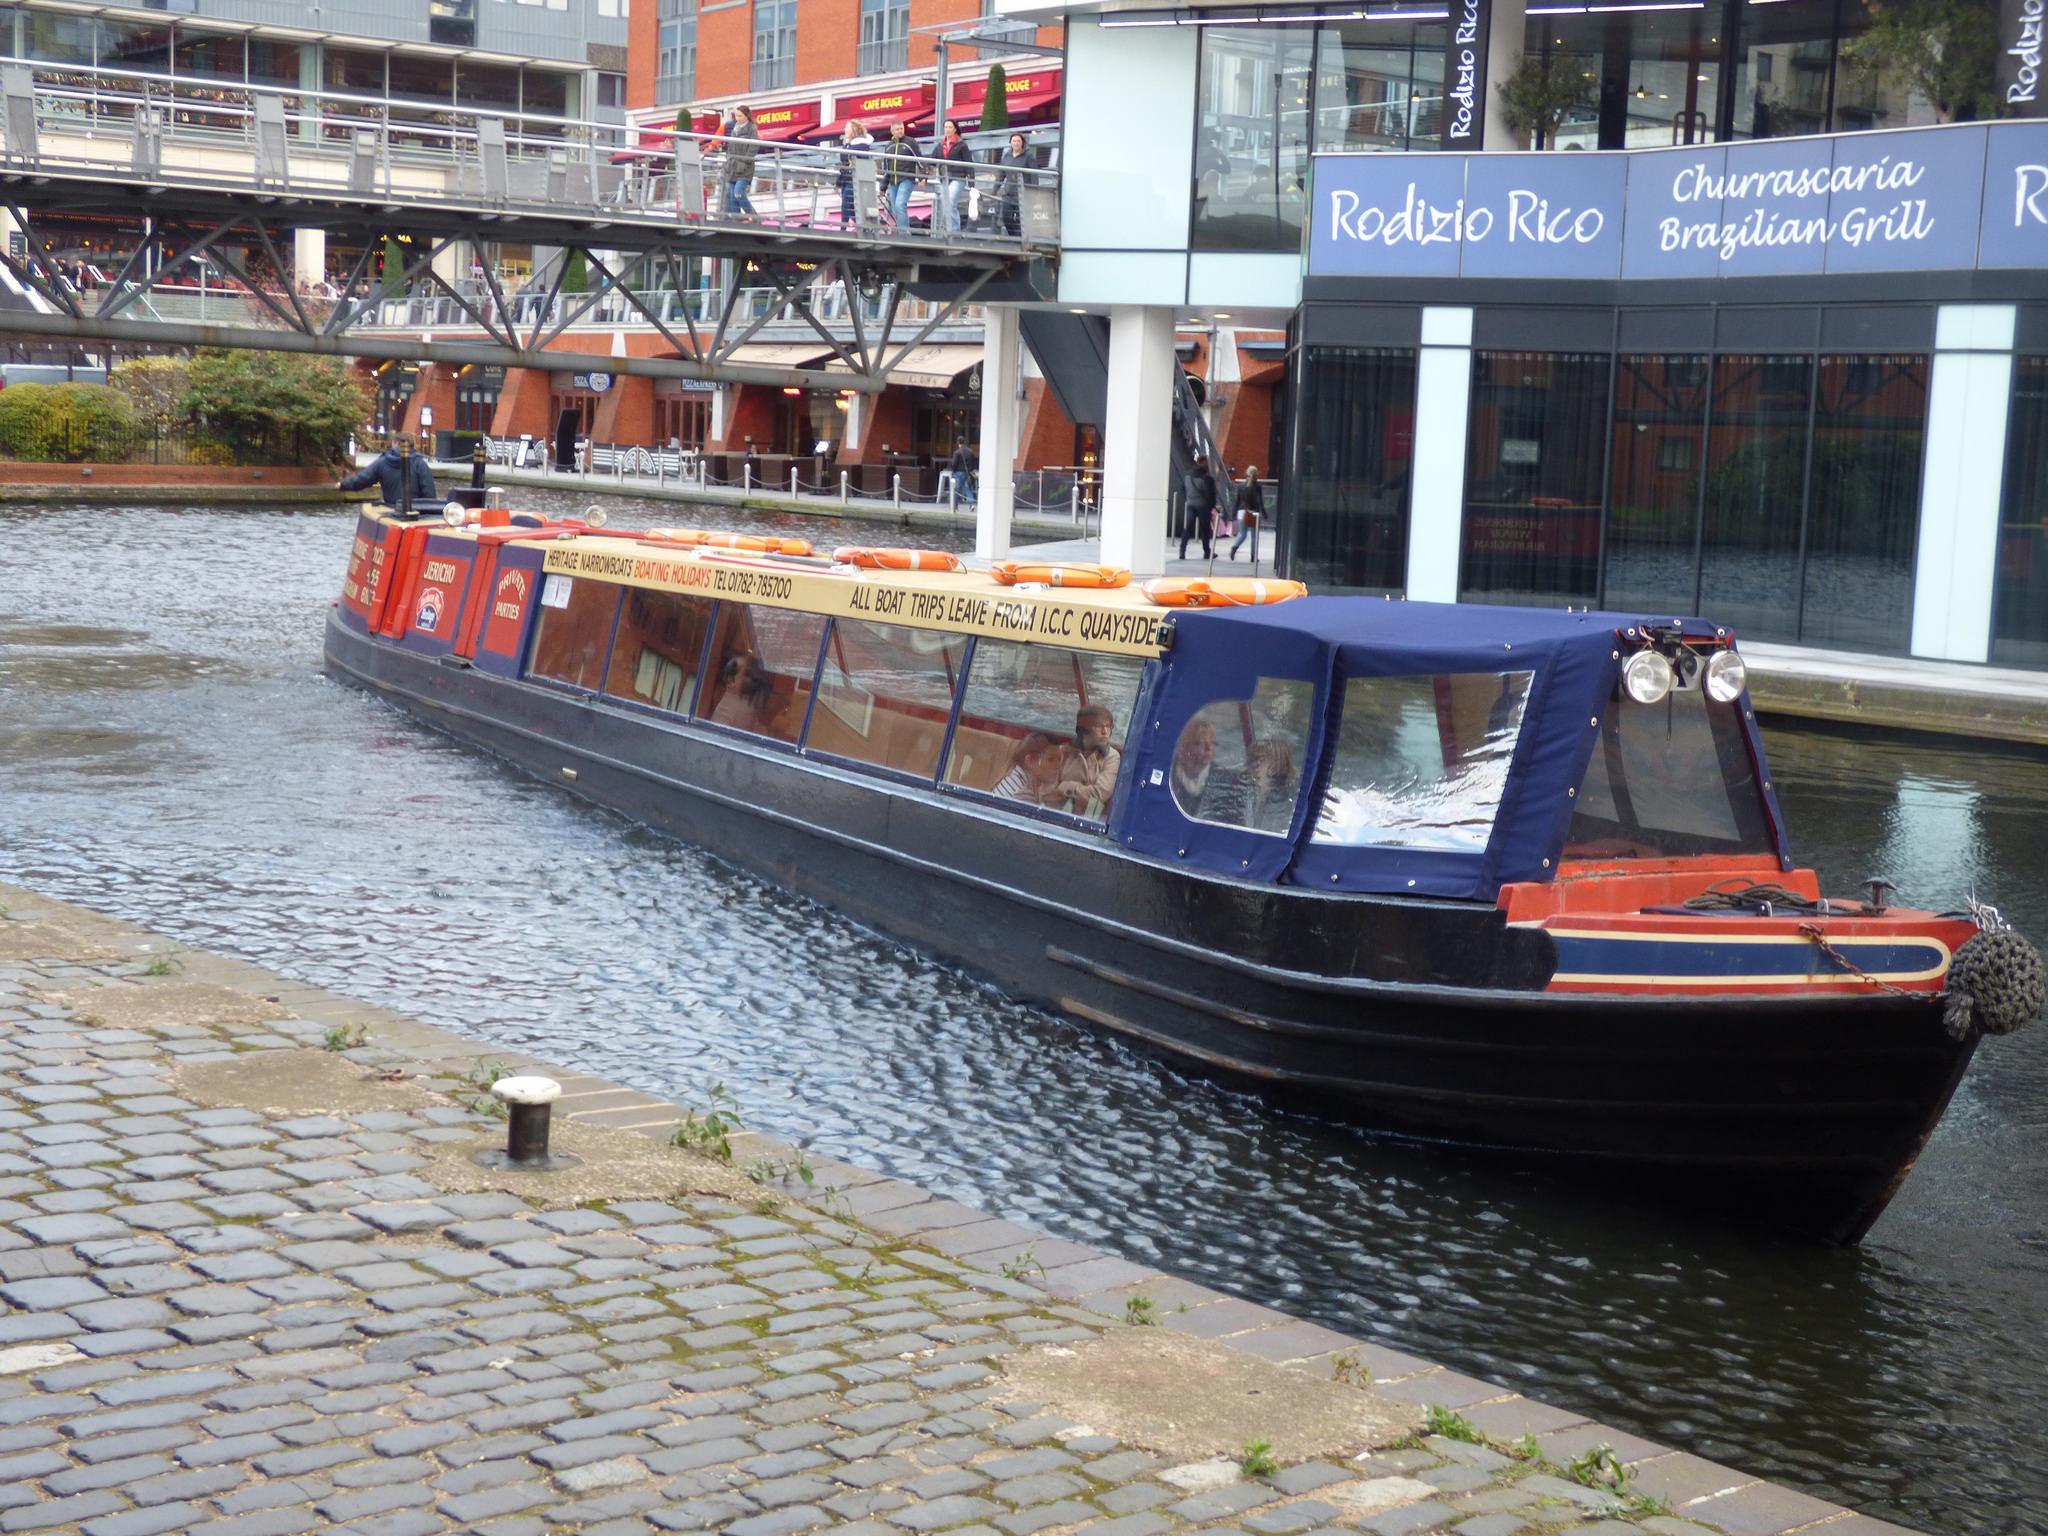 Sherbourne Wharf, Birmingham